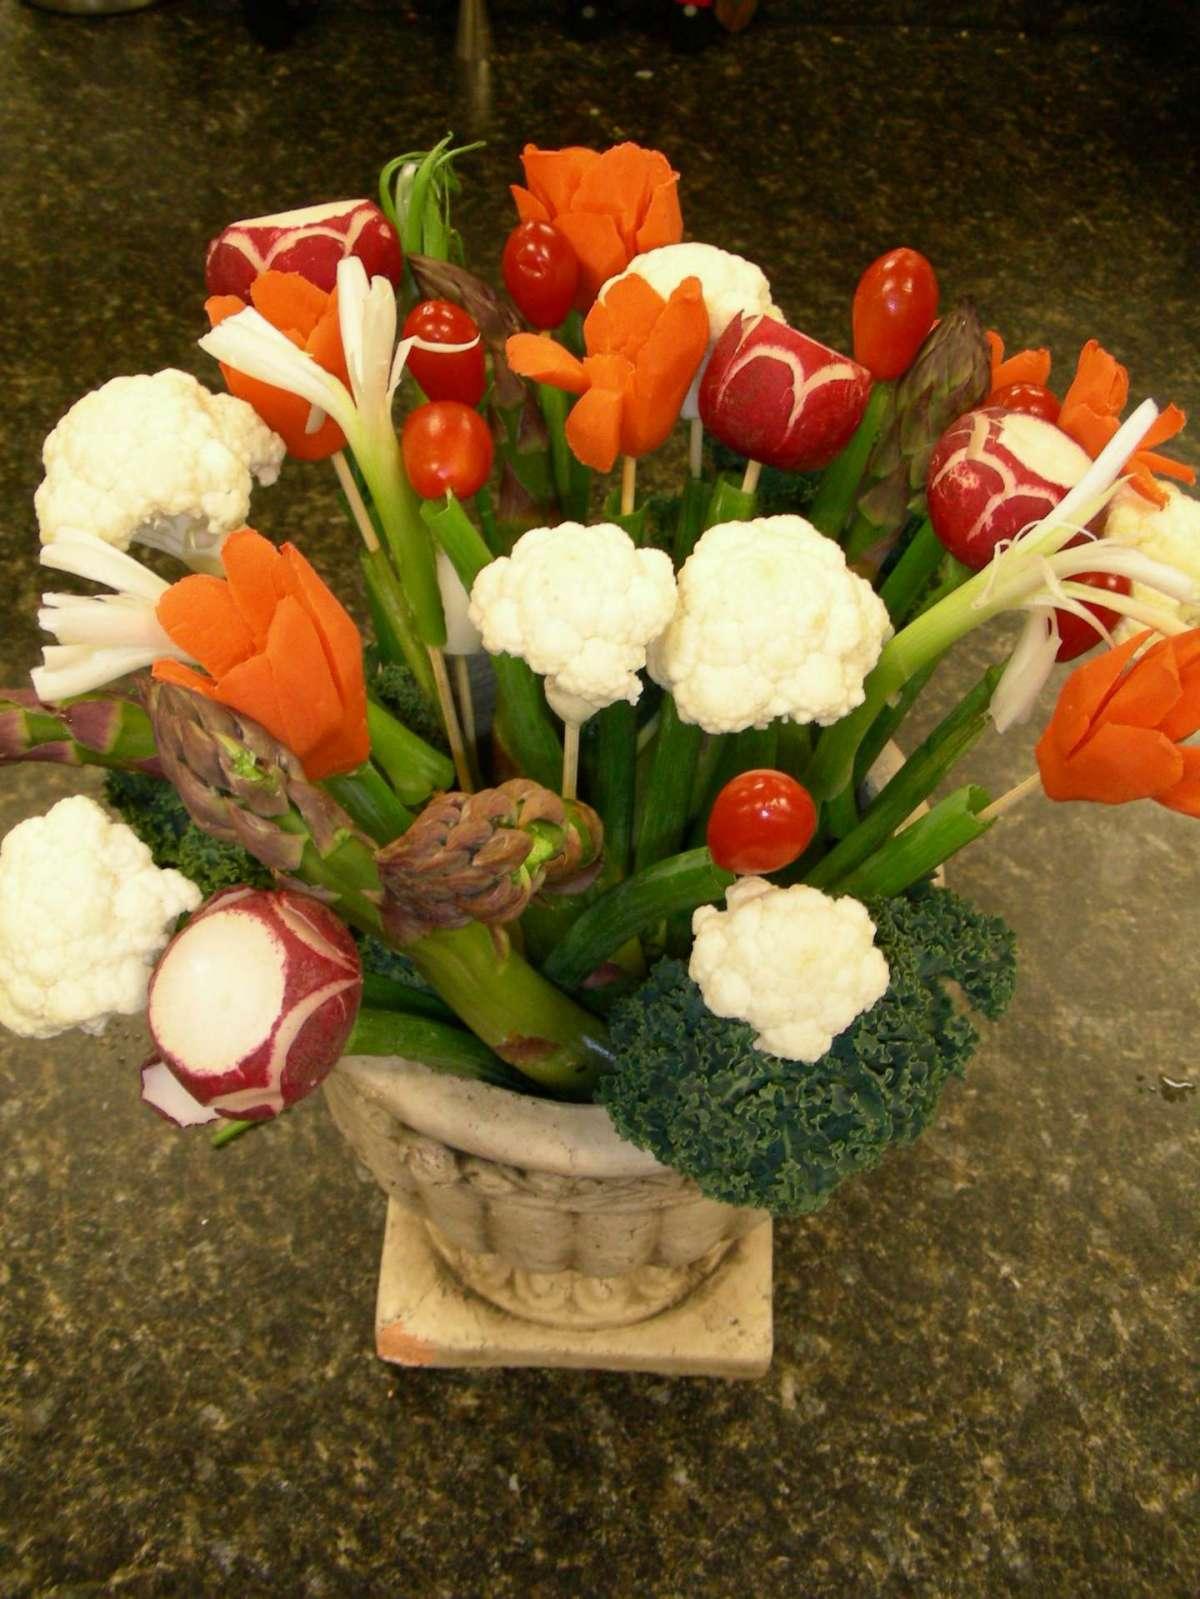 Bouquet con diversi vegetali